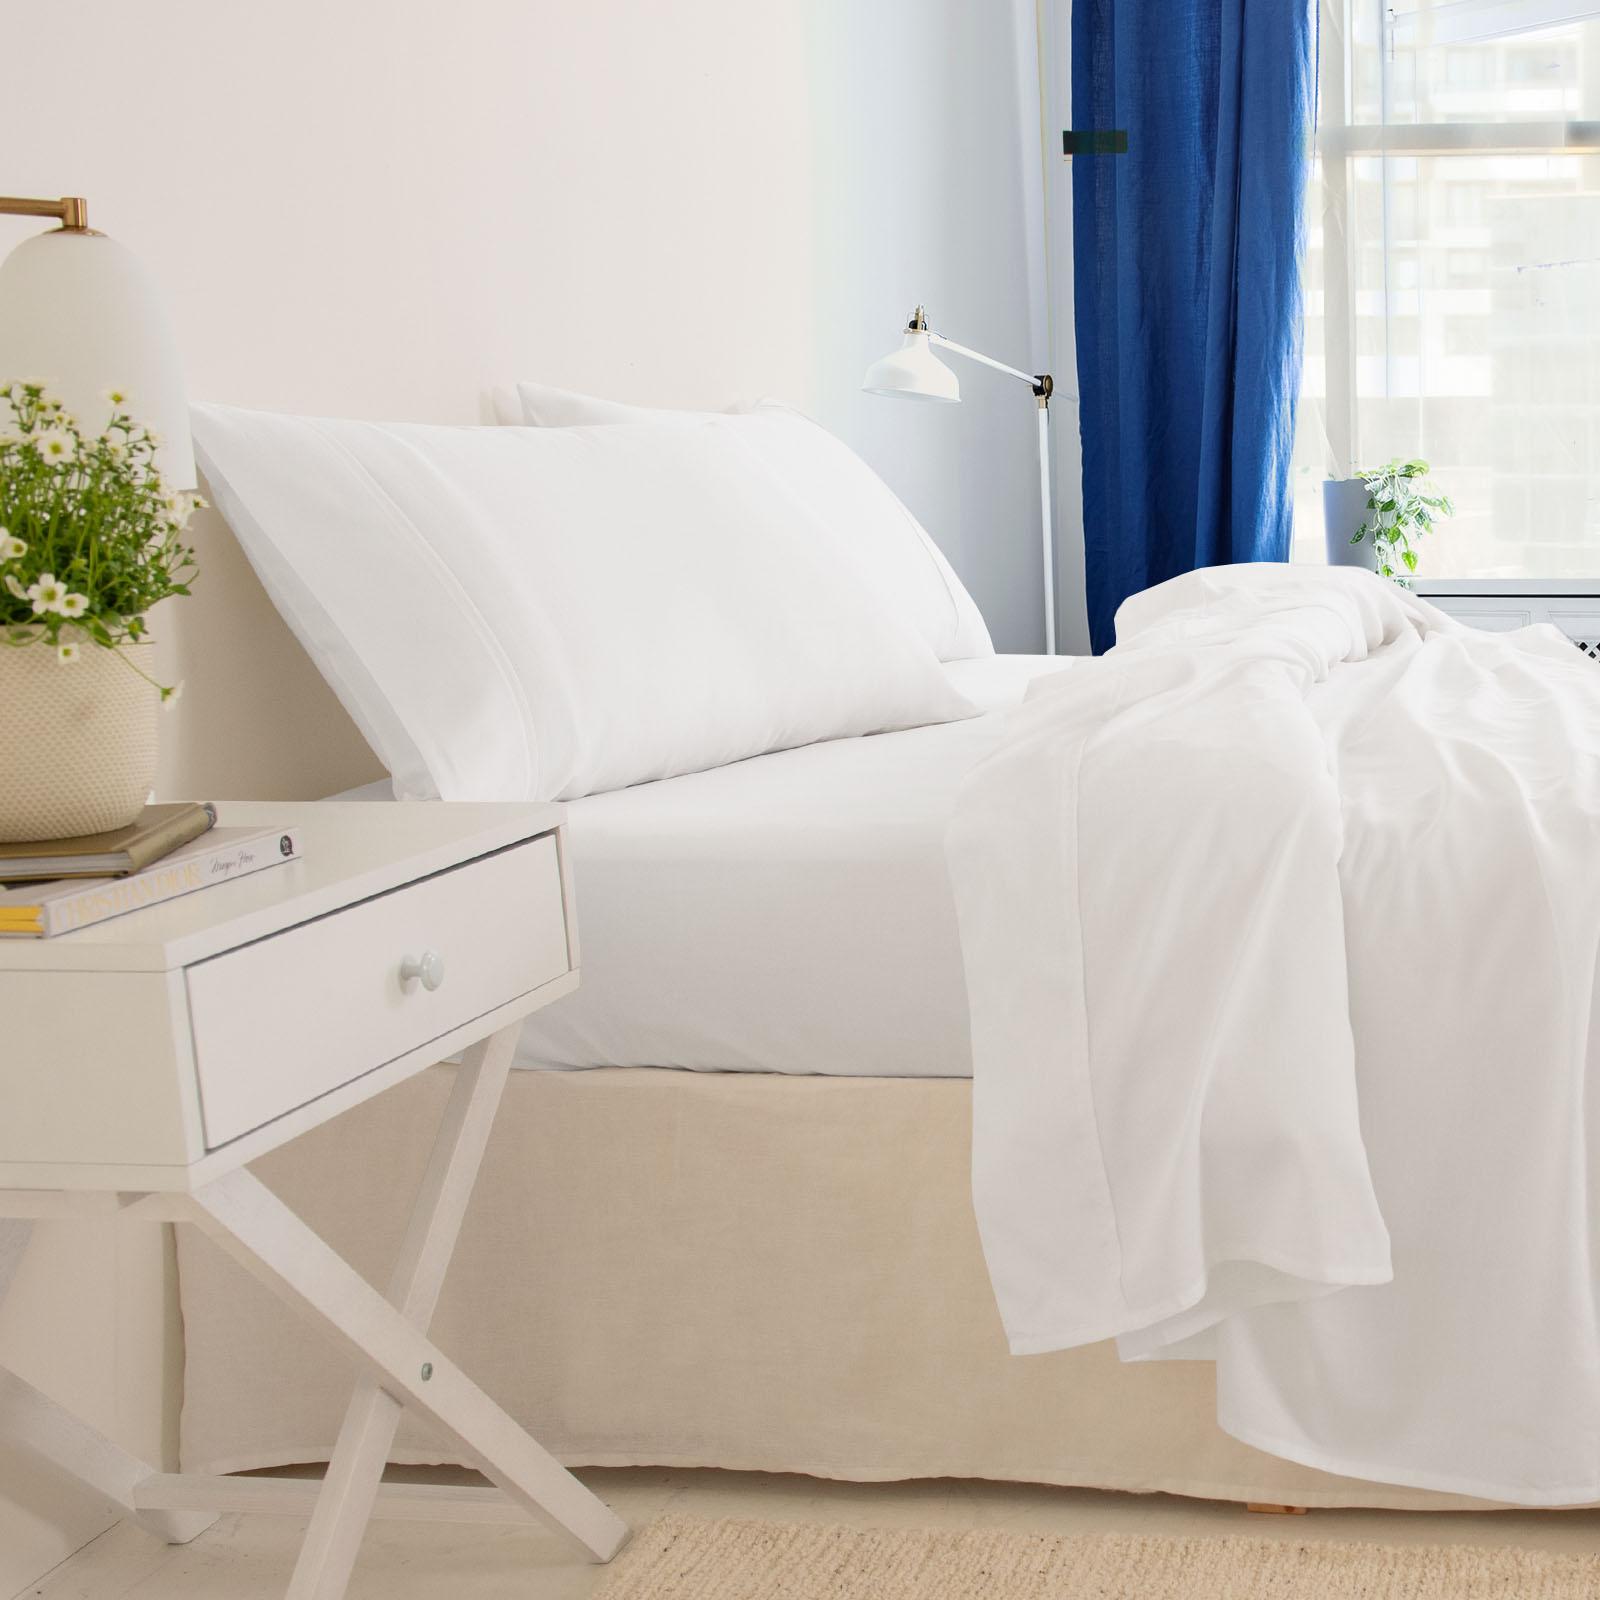 thumbnail 76 - Royal Comfort 1000TC Hotel Grade Bamboo Cotton Sheets Pillowcases Set Ultrasoft